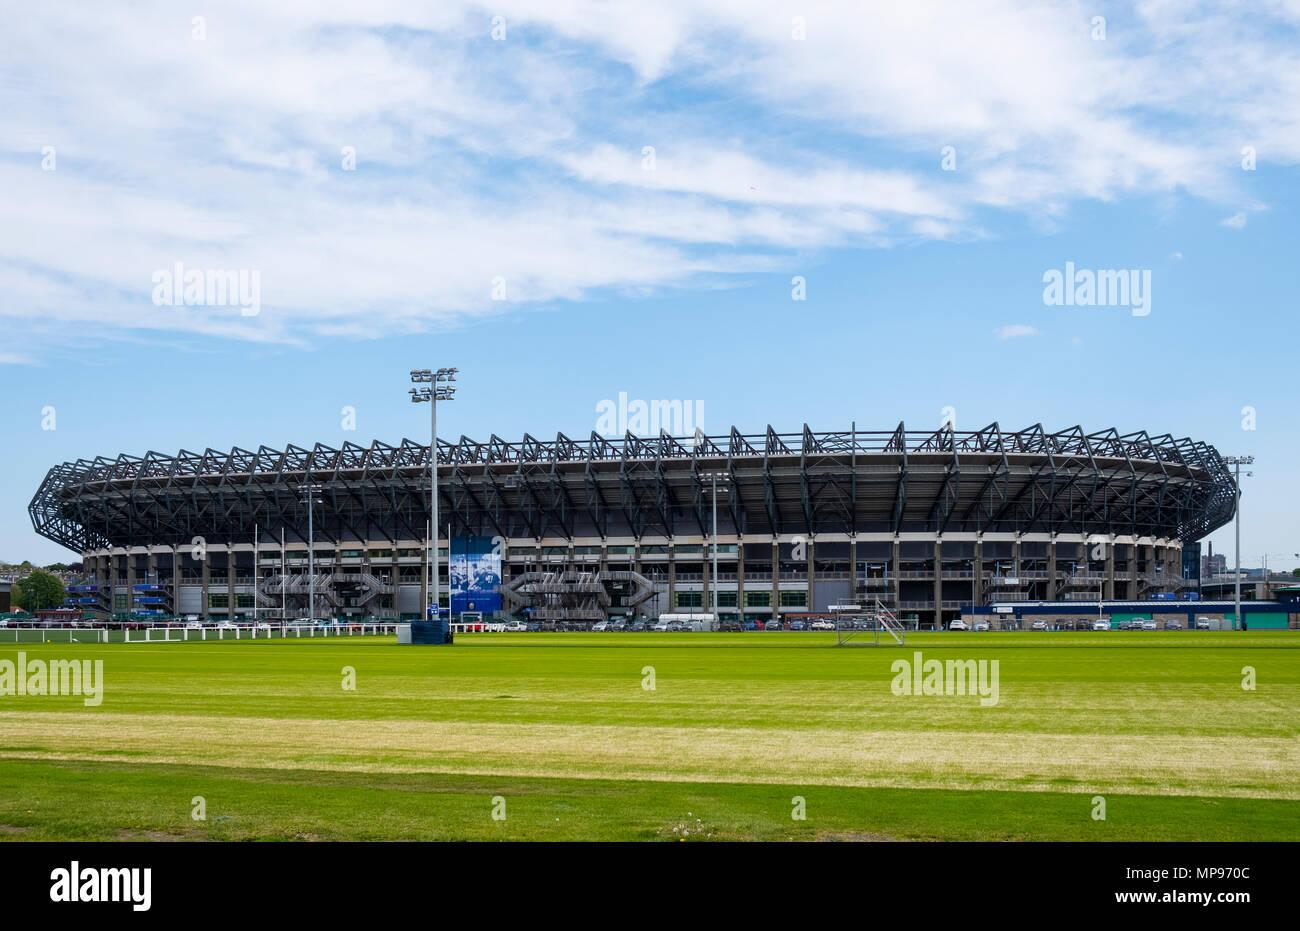 View of Murrayfield Stadium home of Scottish rugby union in Edinburgh, Scotland, United Kingdom, UK - Stock Image